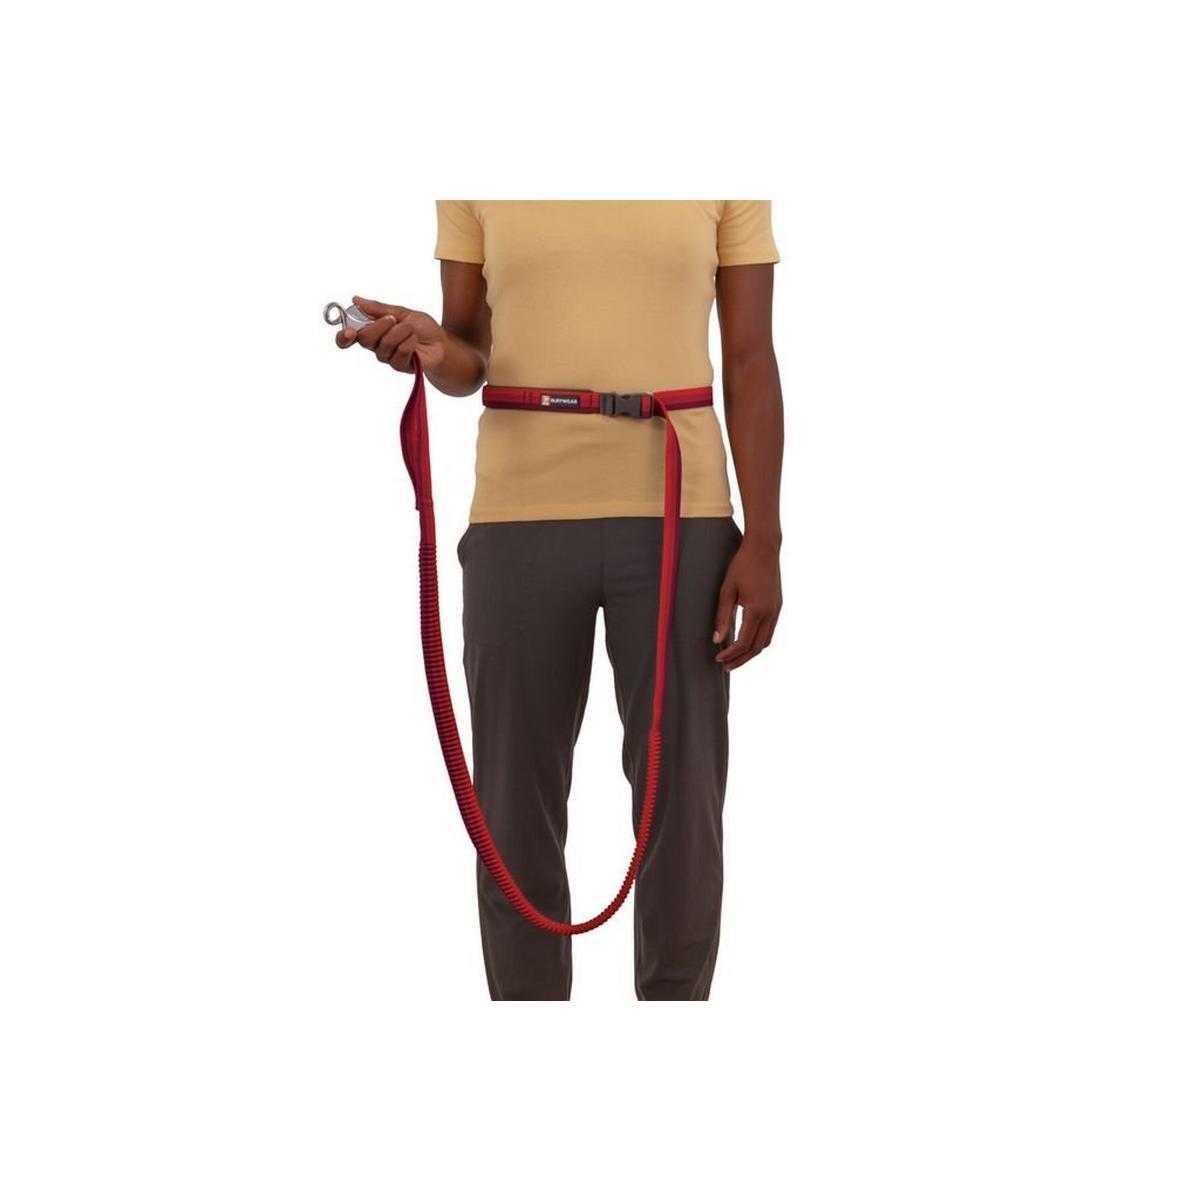 Ruffwear Roamer Leash - Red Sumac